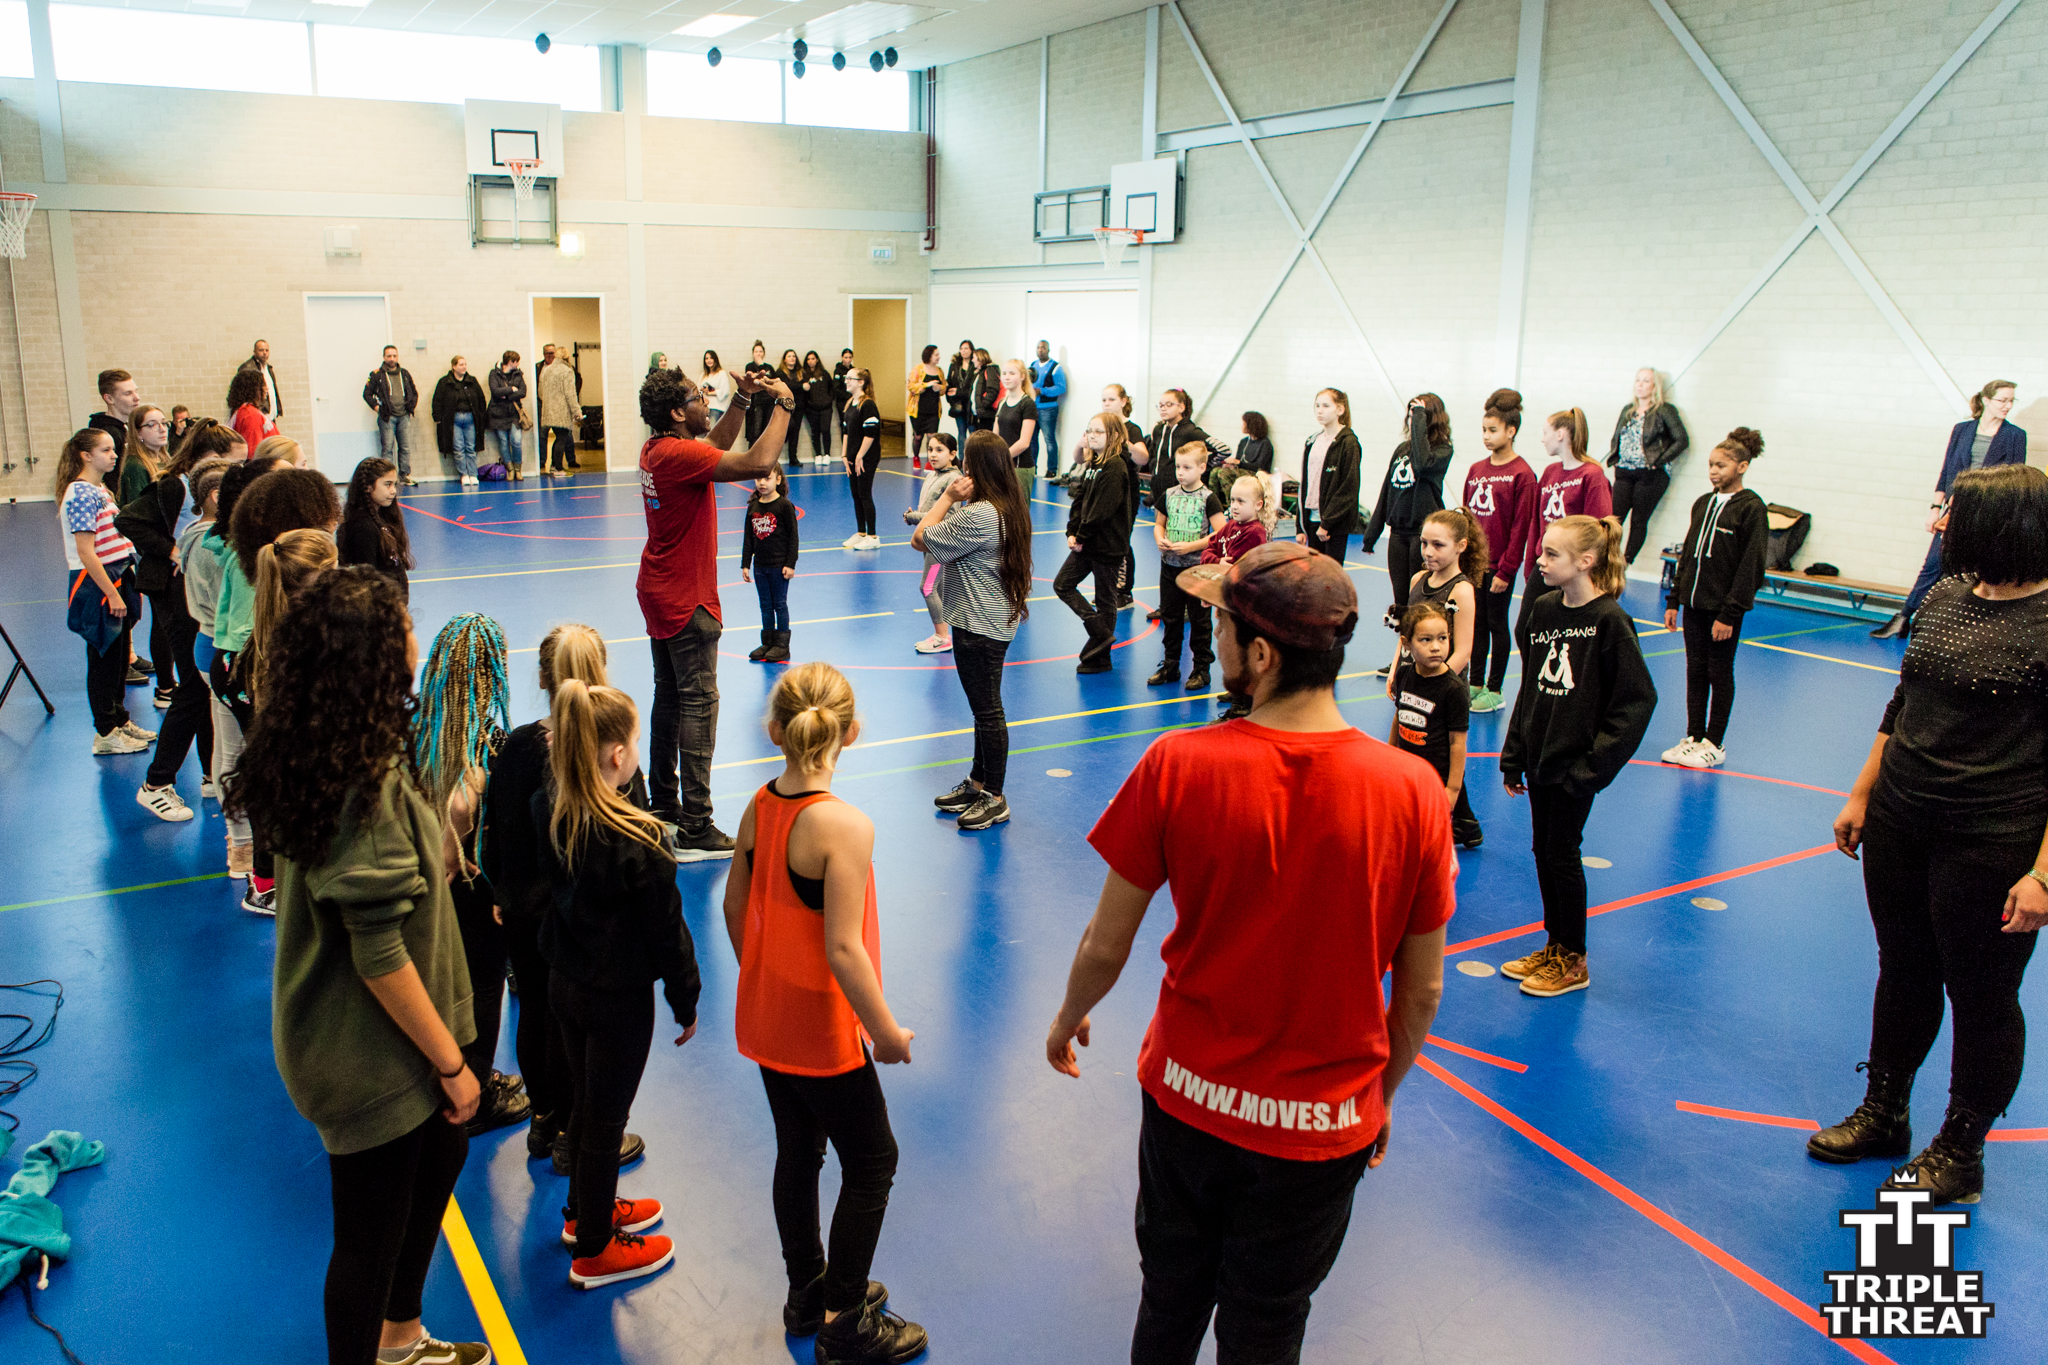 Triple ThreaT koppelt dans en basketball aan cultuur. (foto aangeleverd0